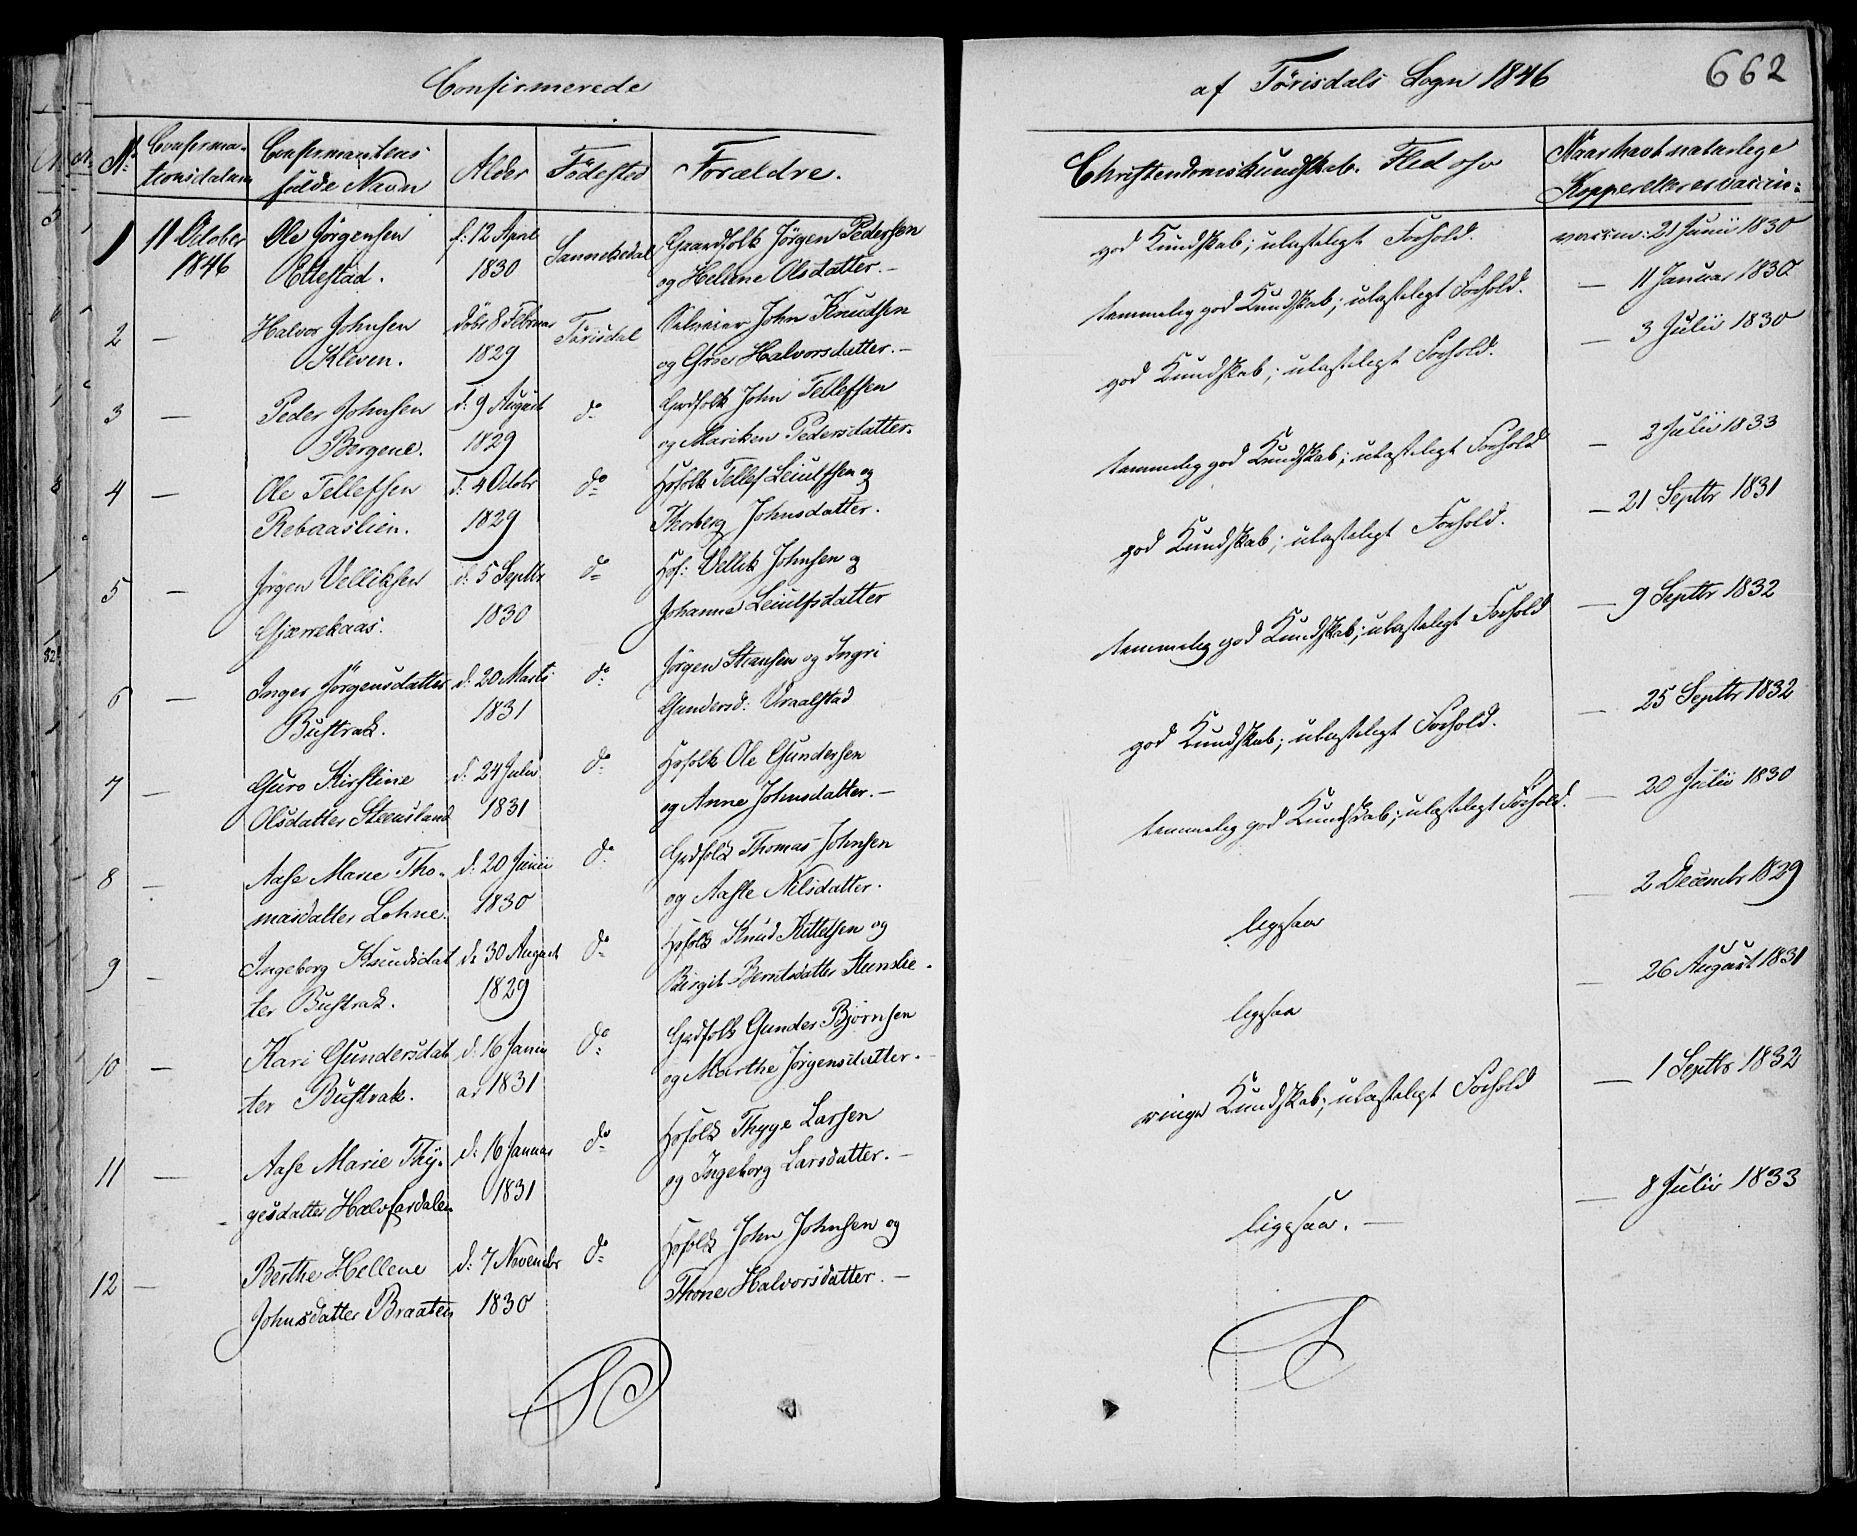 SAKO, Drangedal kirkebøker, F/Fa/L0007b: Ministerialbok nr. 7b, 1837-1856, s. 662